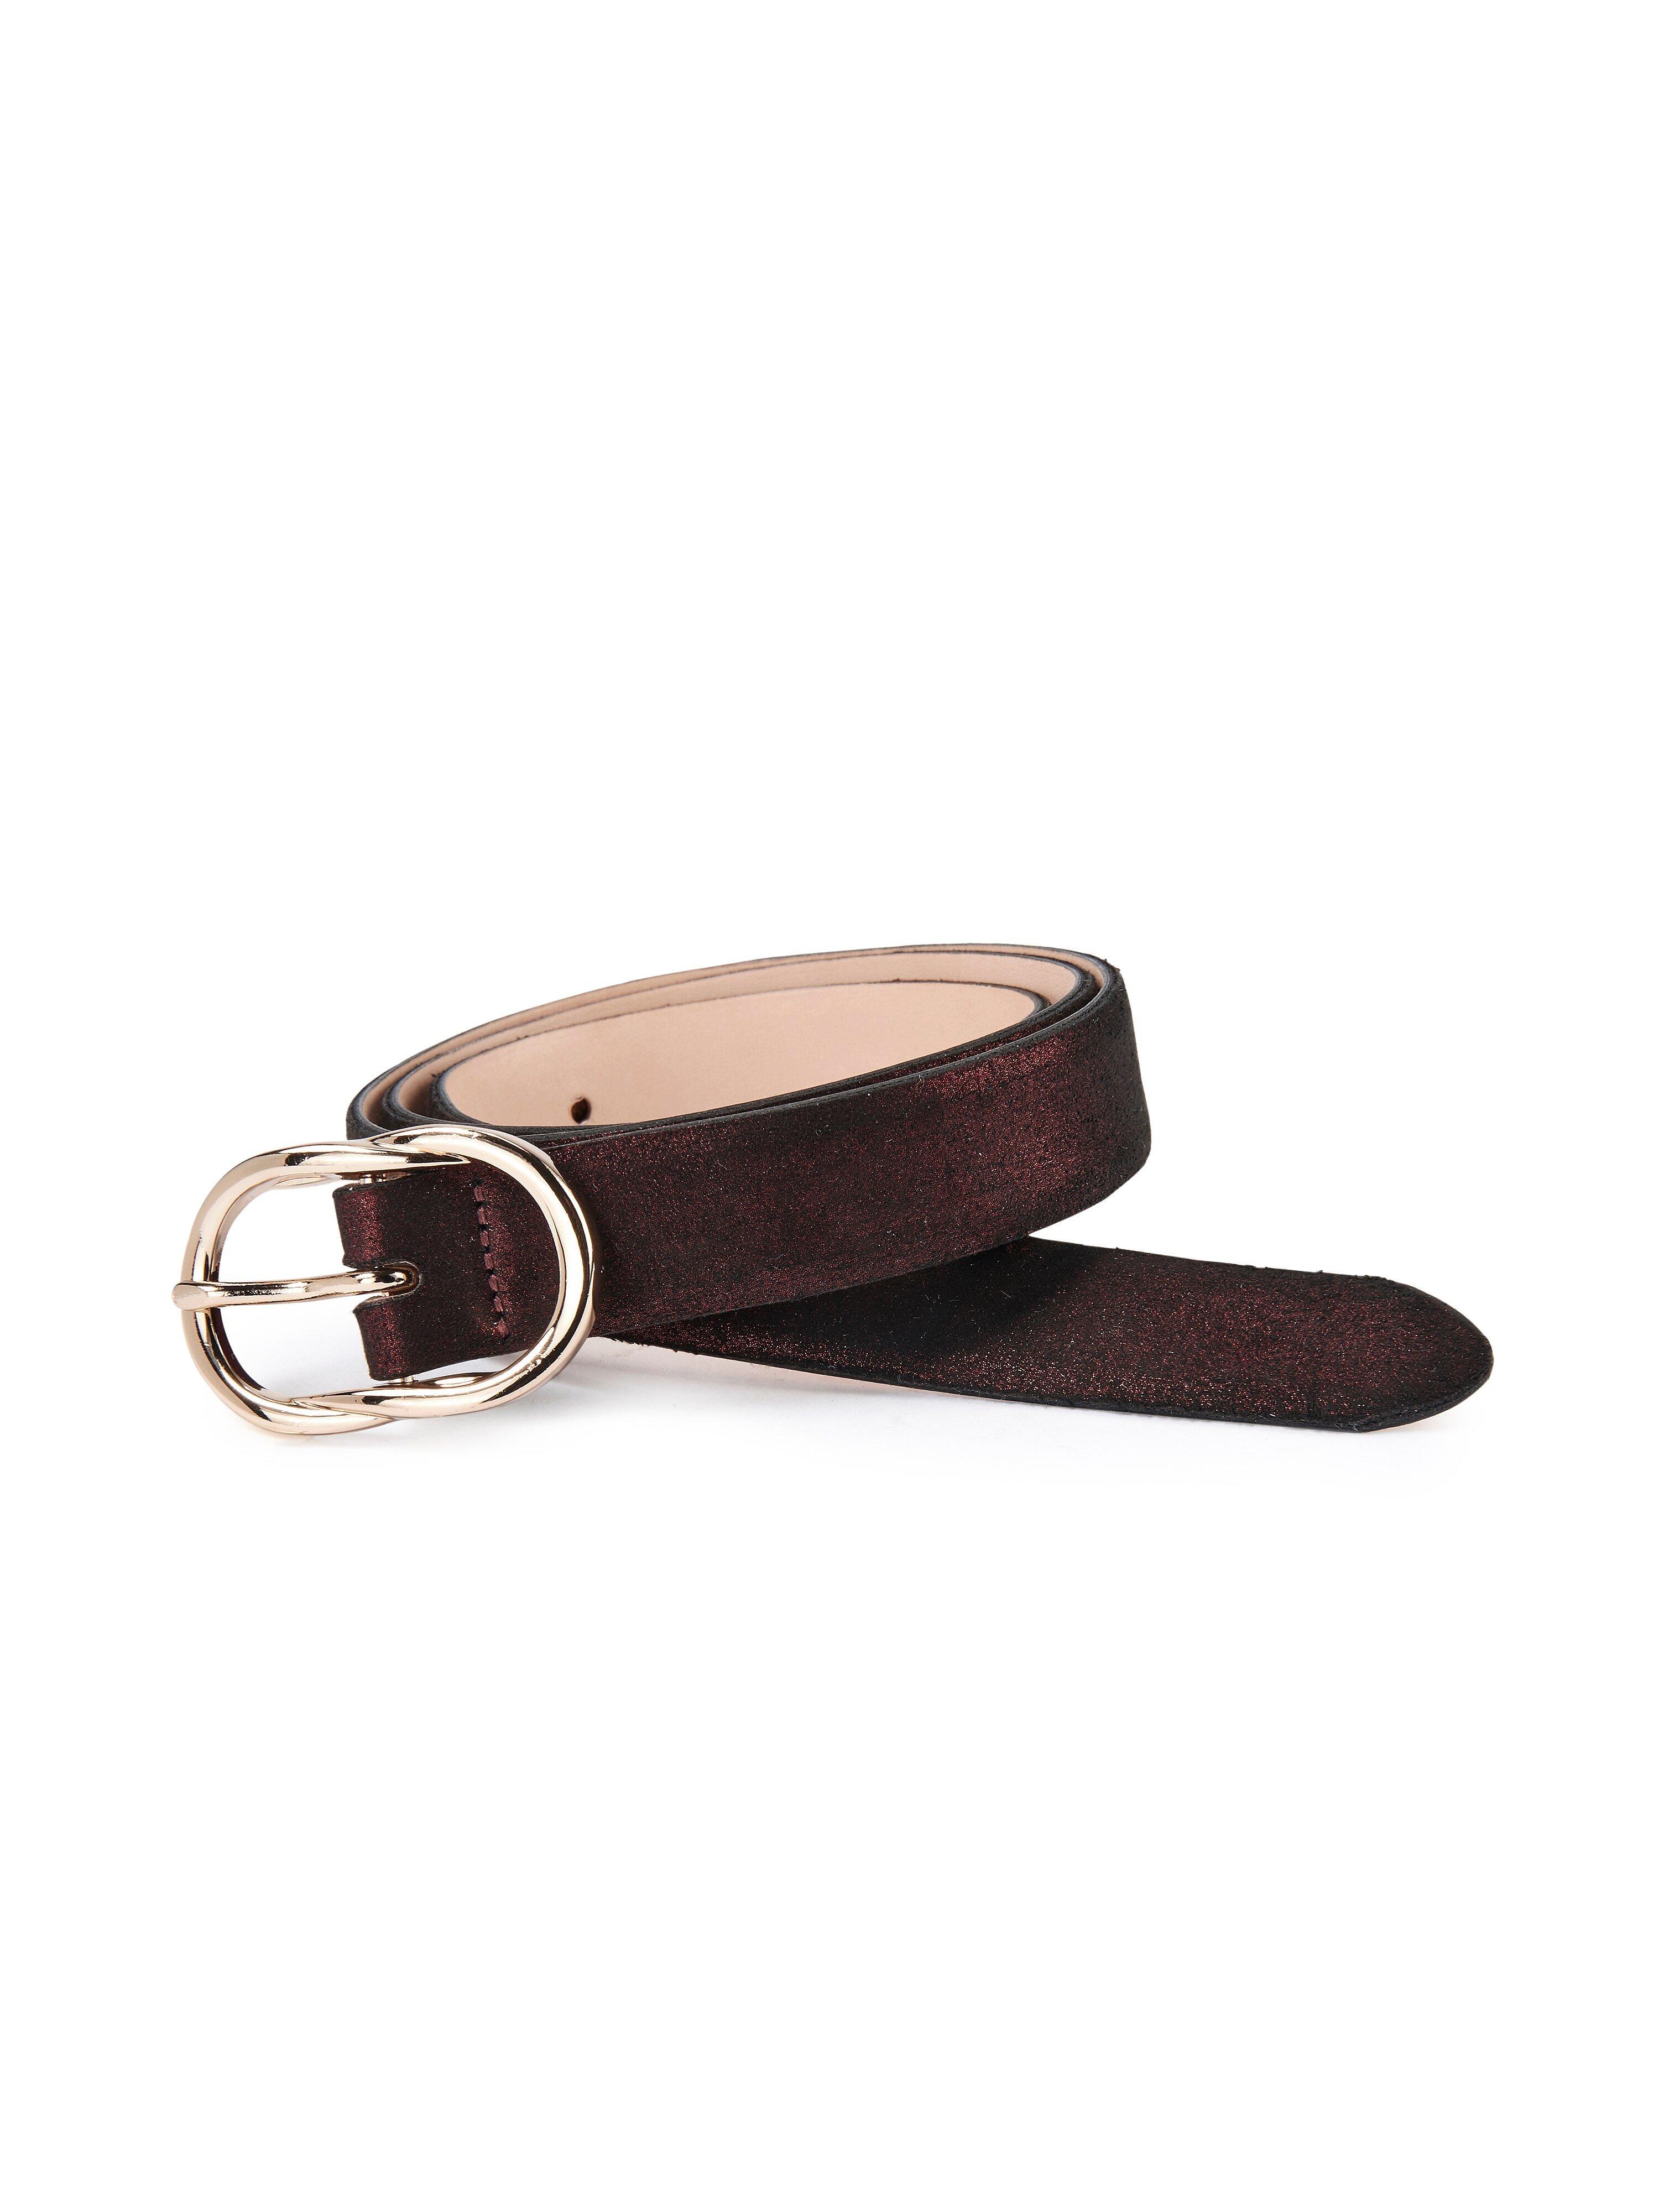 La ceinture  Uta Raasch rouge taille 105